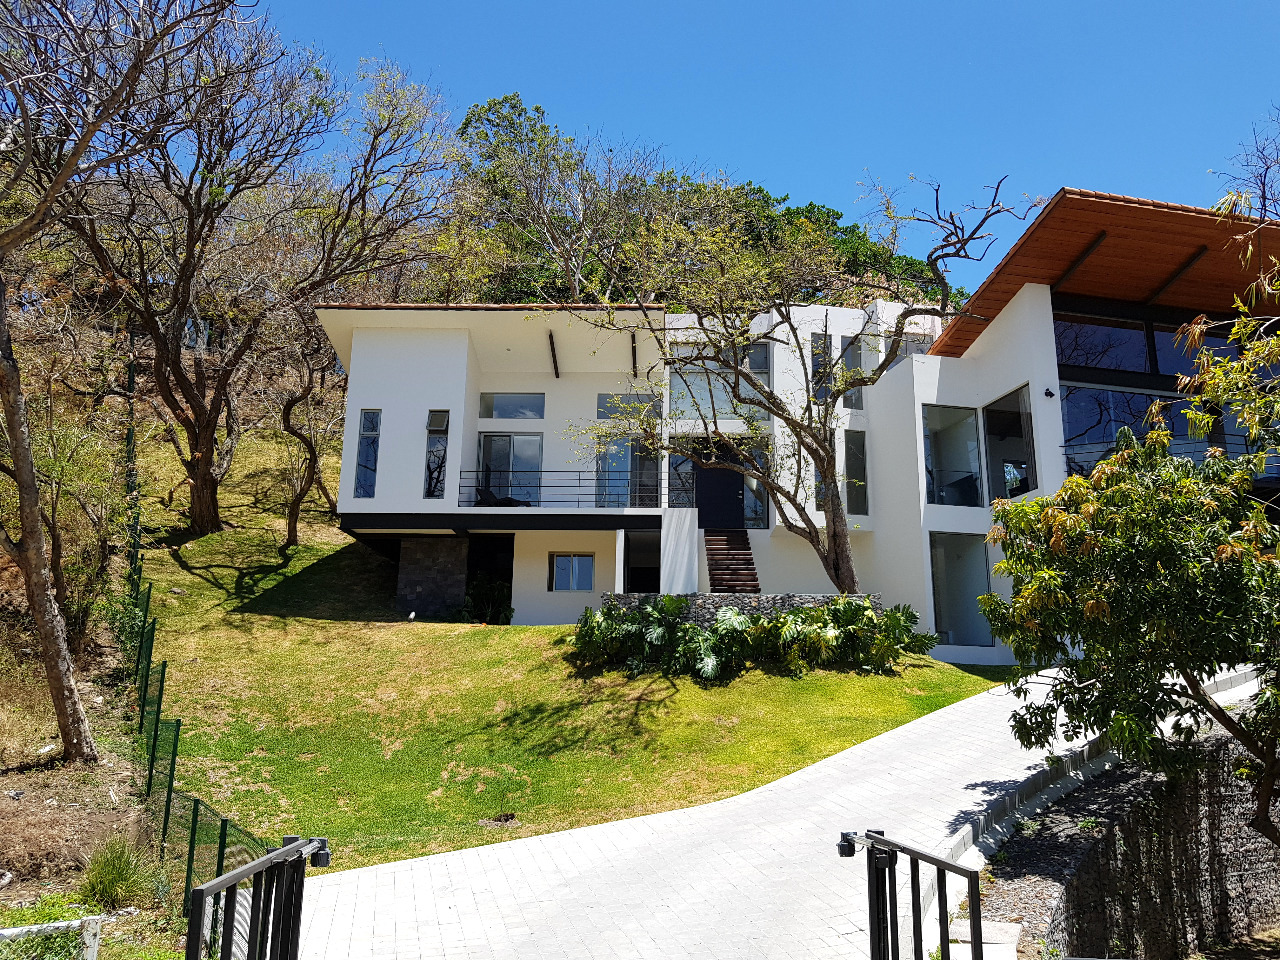 Modern Home for sale in Santa Ana